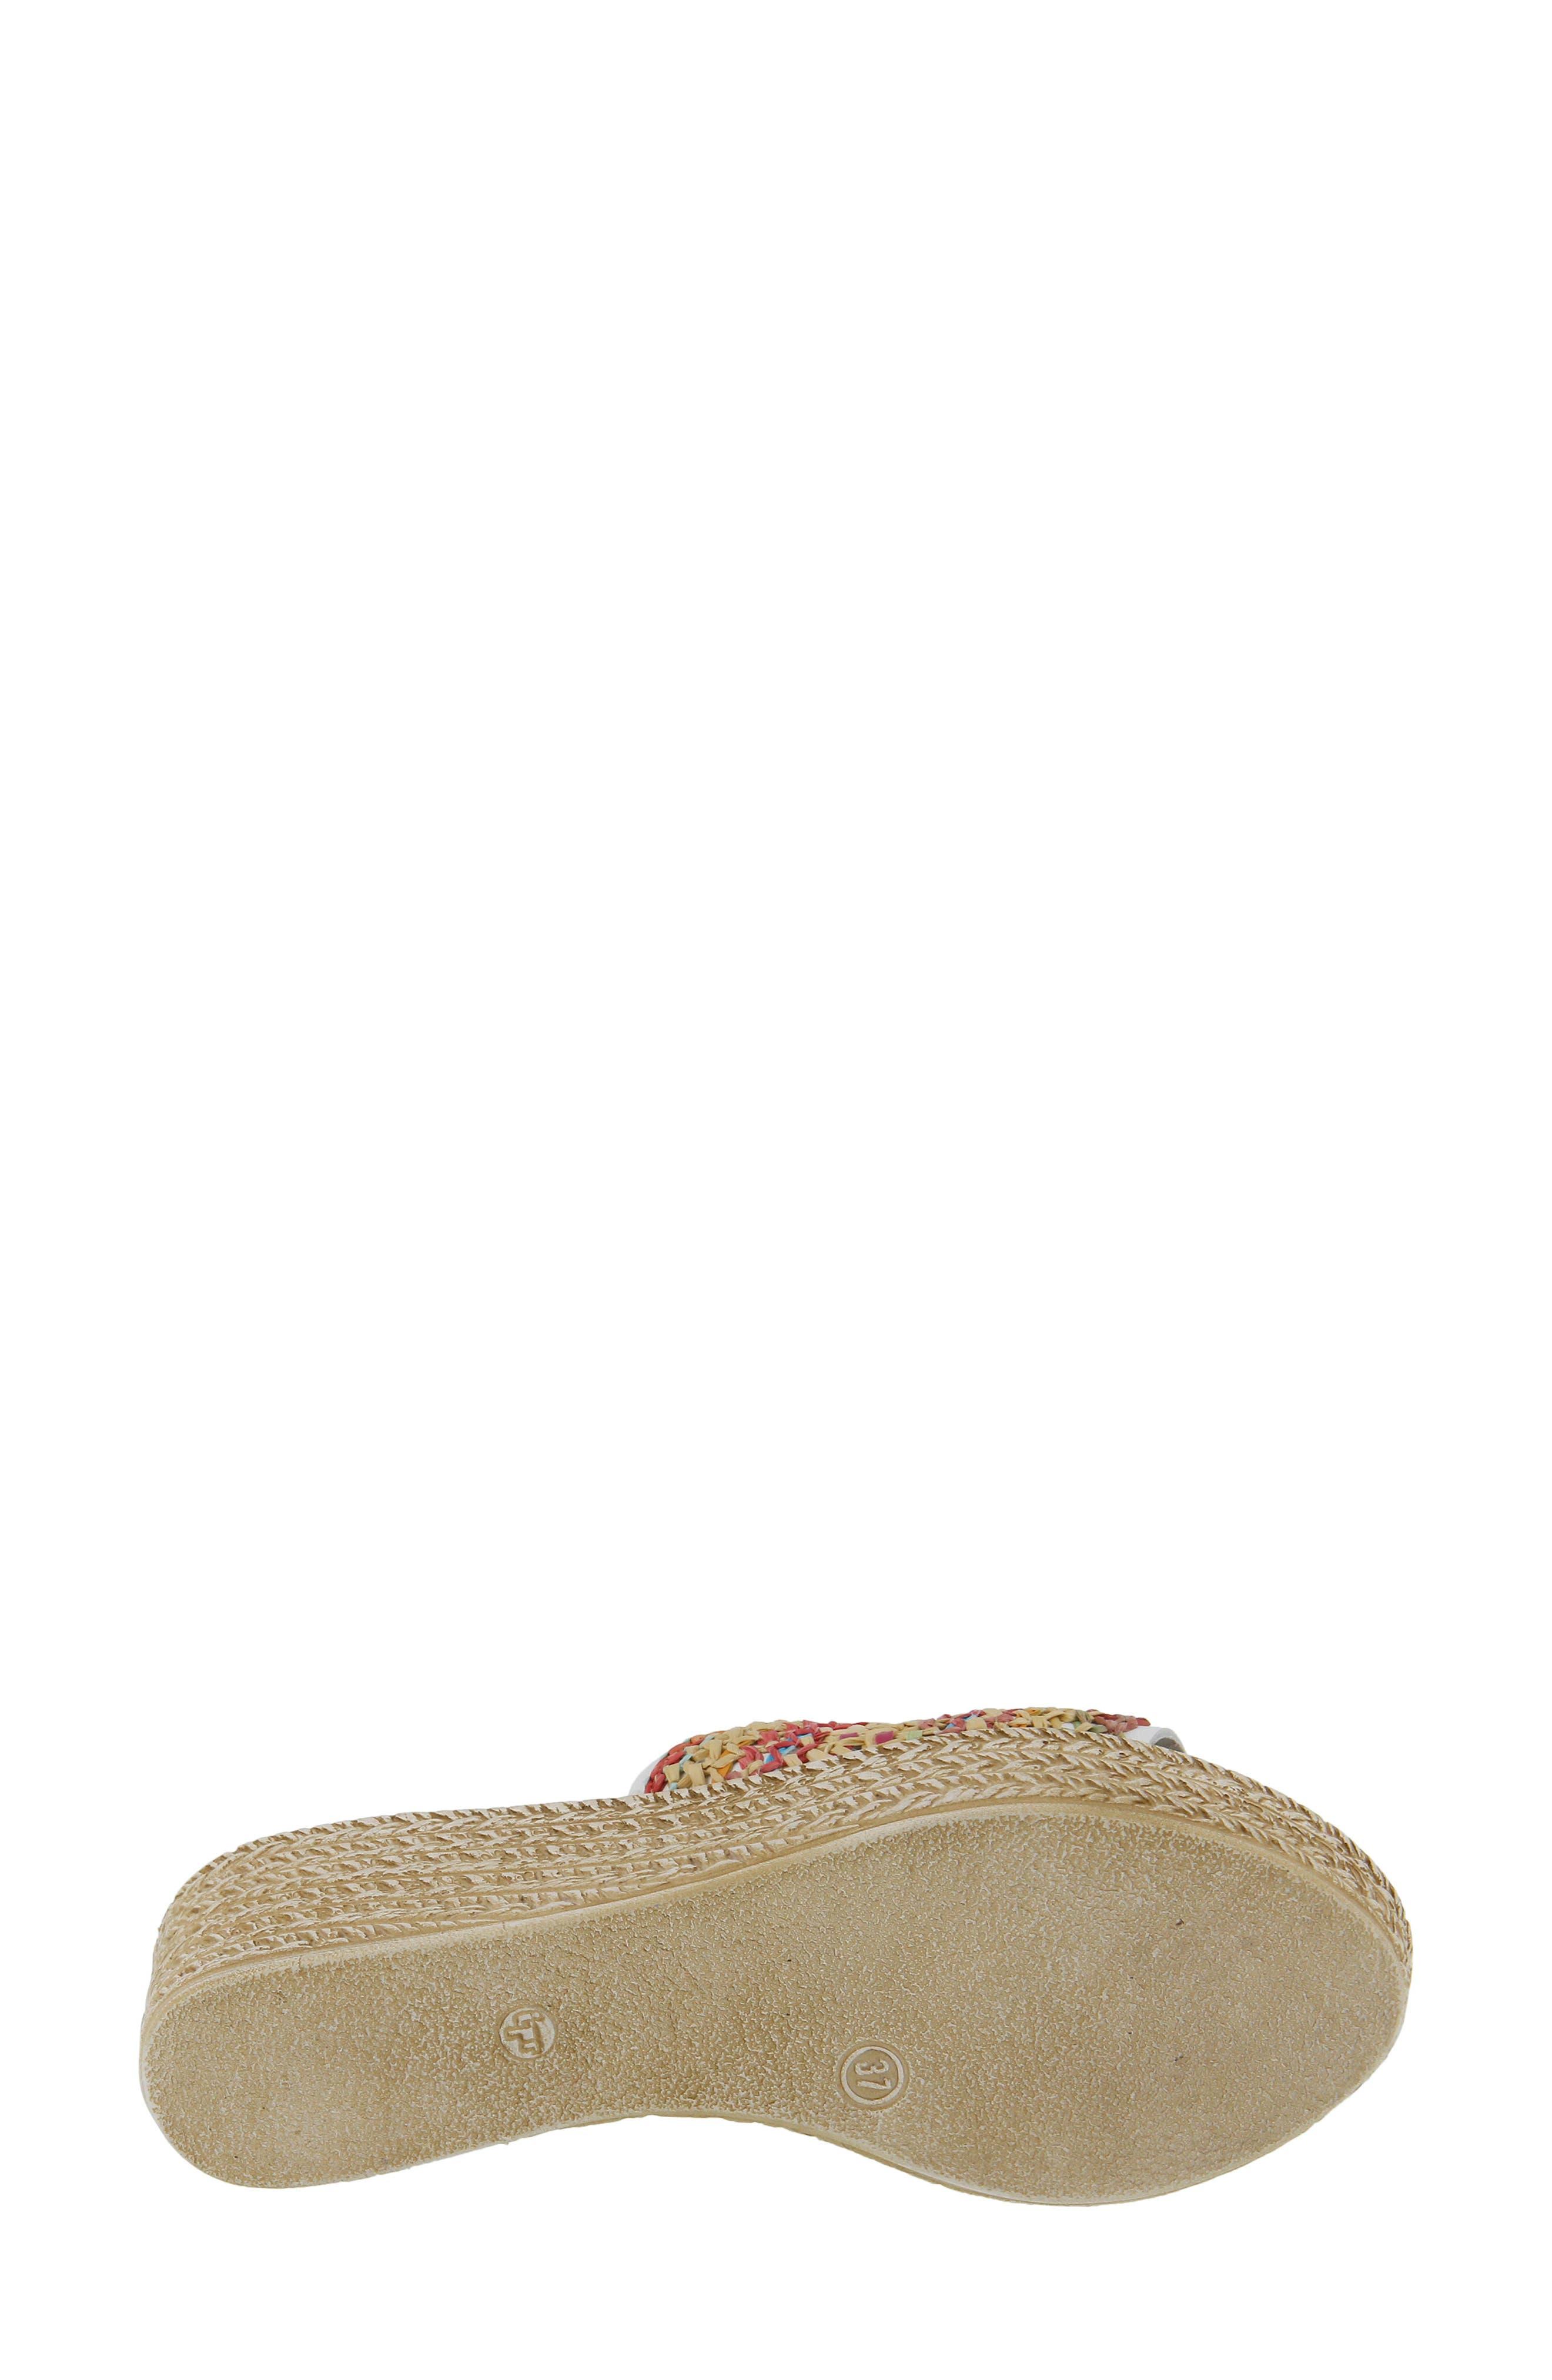 Calci Espadrille Wedge Sandal,                             Alternate thumbnail 5, color,                             White Leather